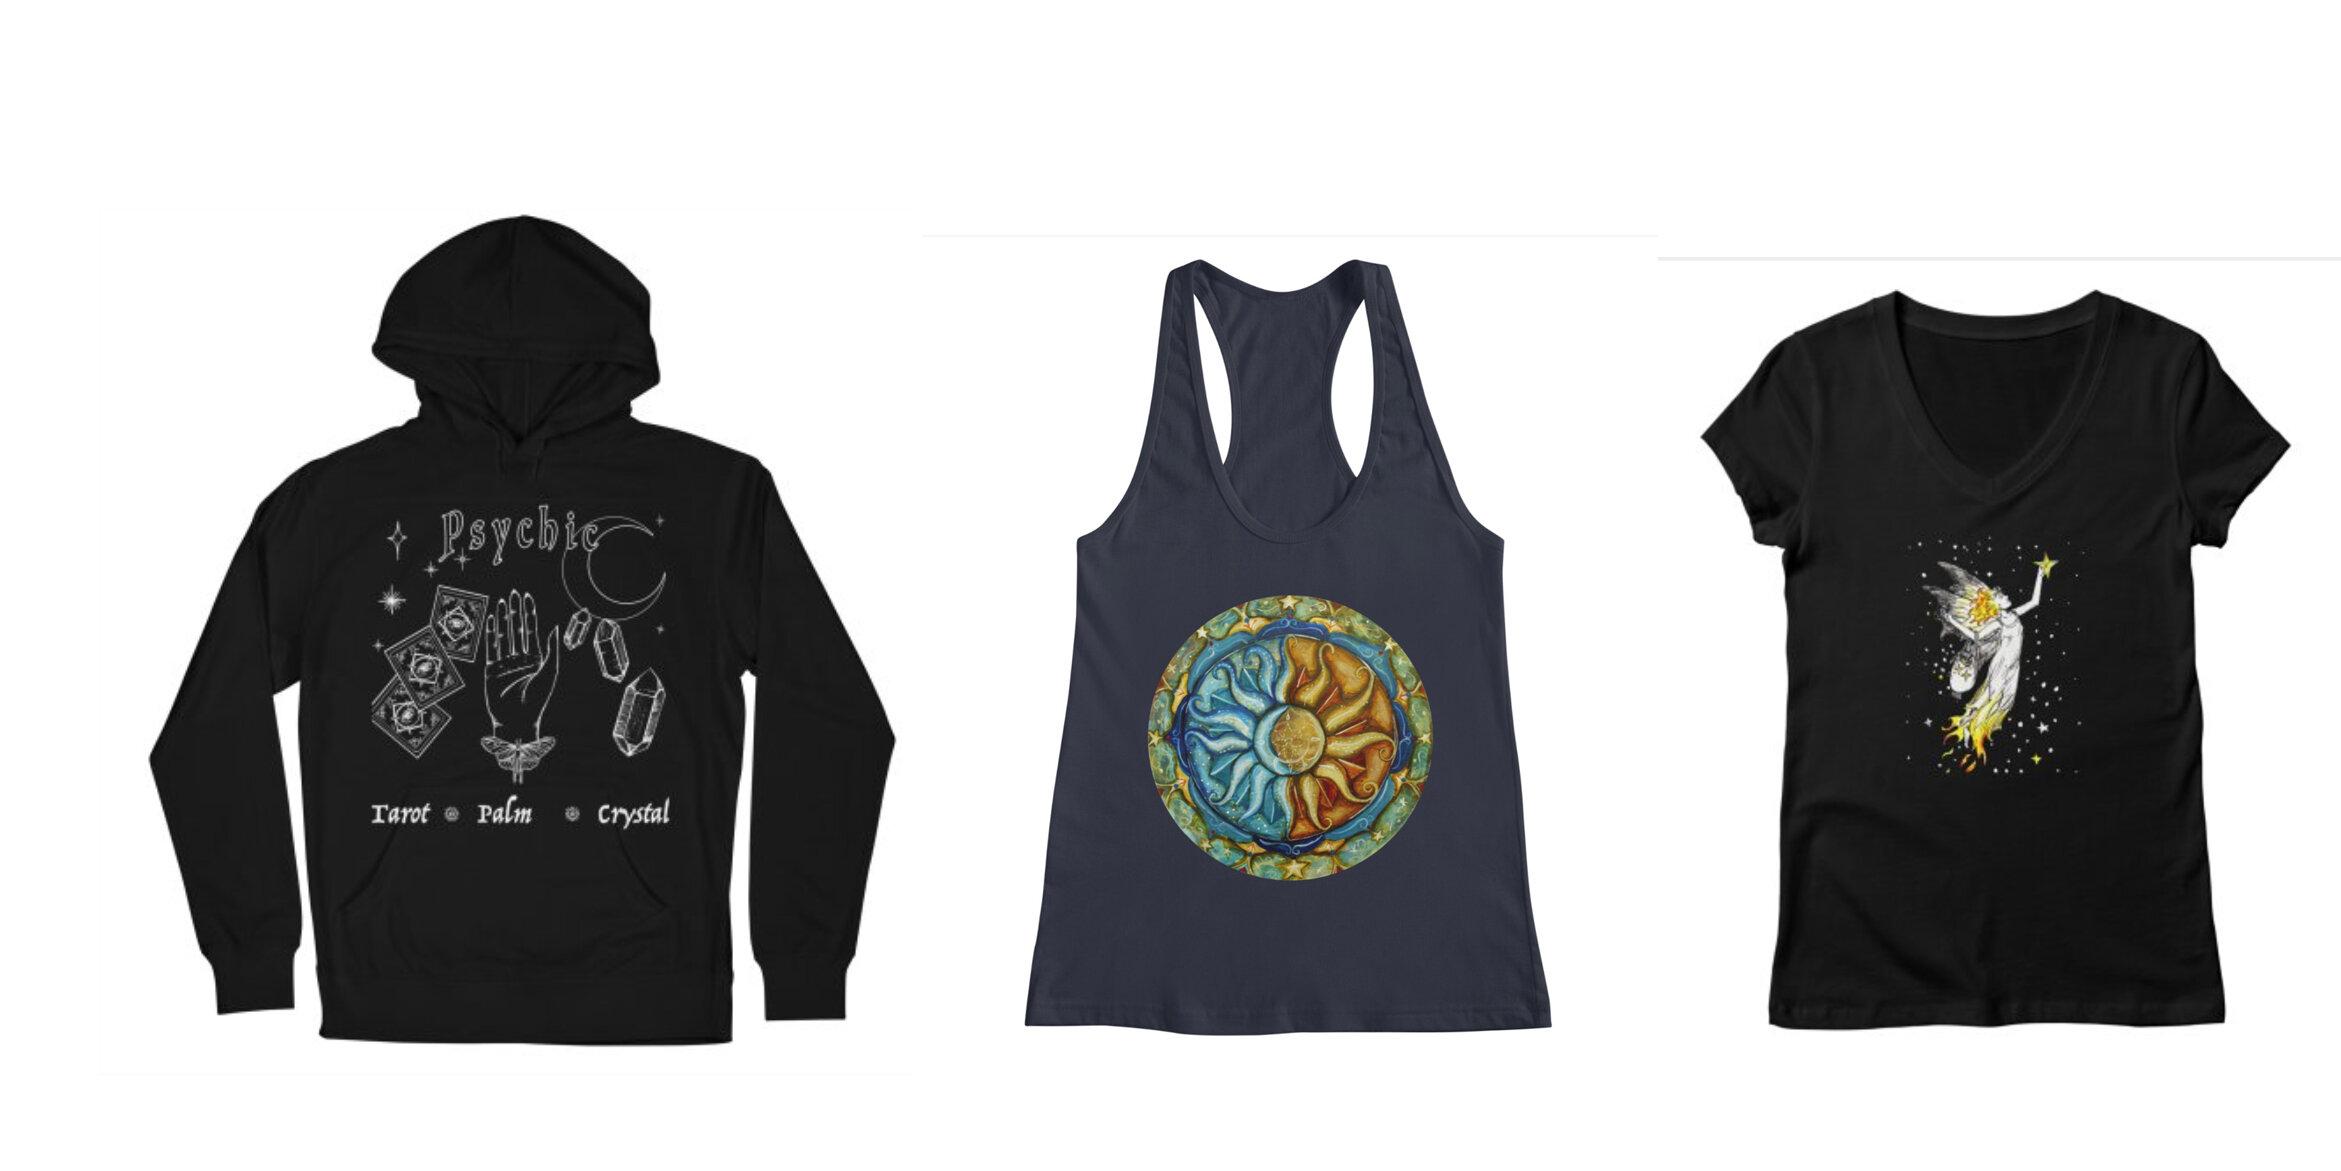 Tree Talker Art Shop Update New Clothing